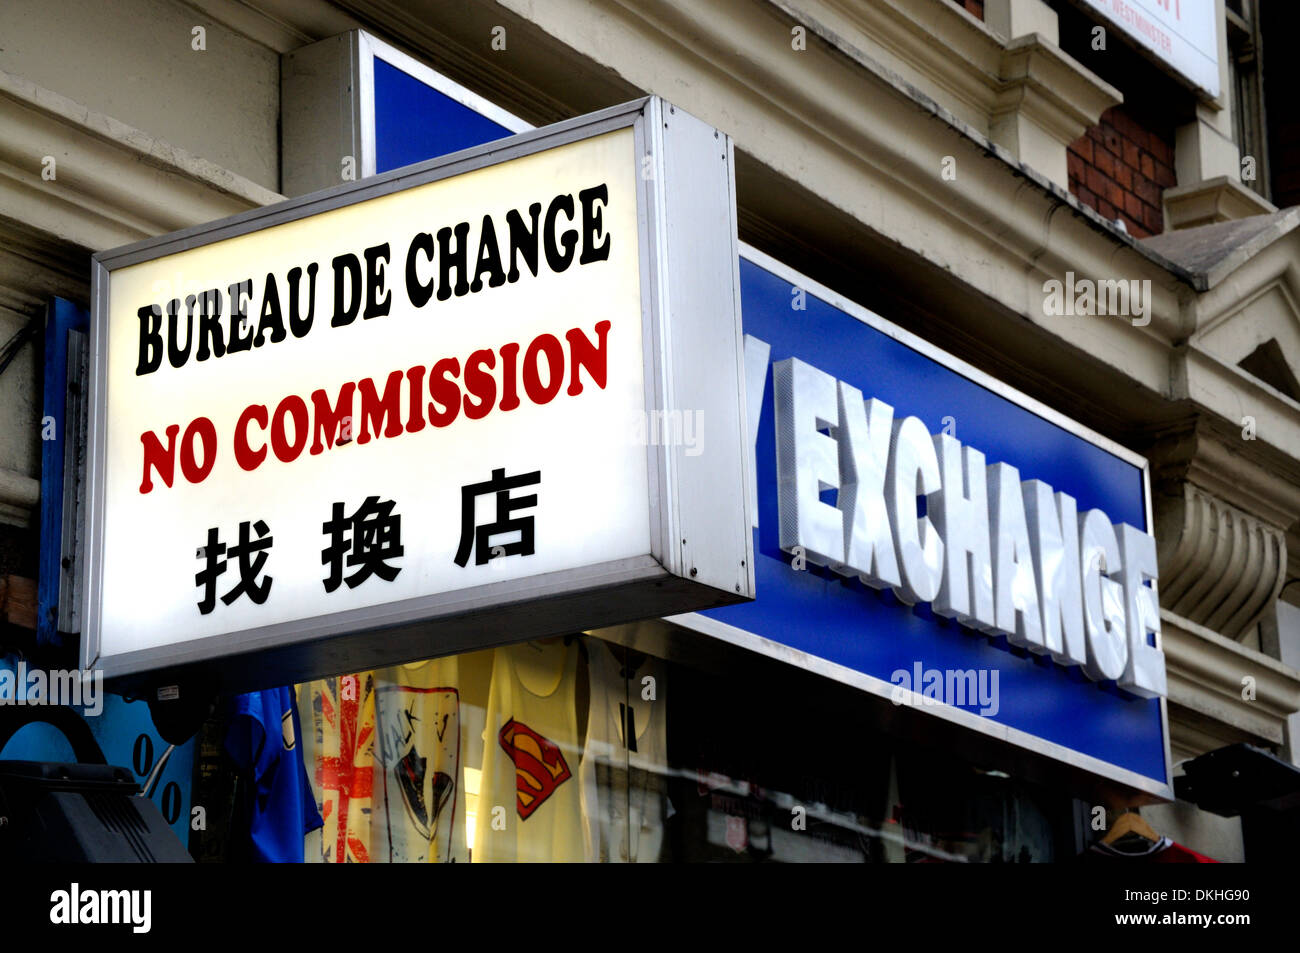 Bureau De Change No Commission High Resolution Stock Photography And Images Alamy